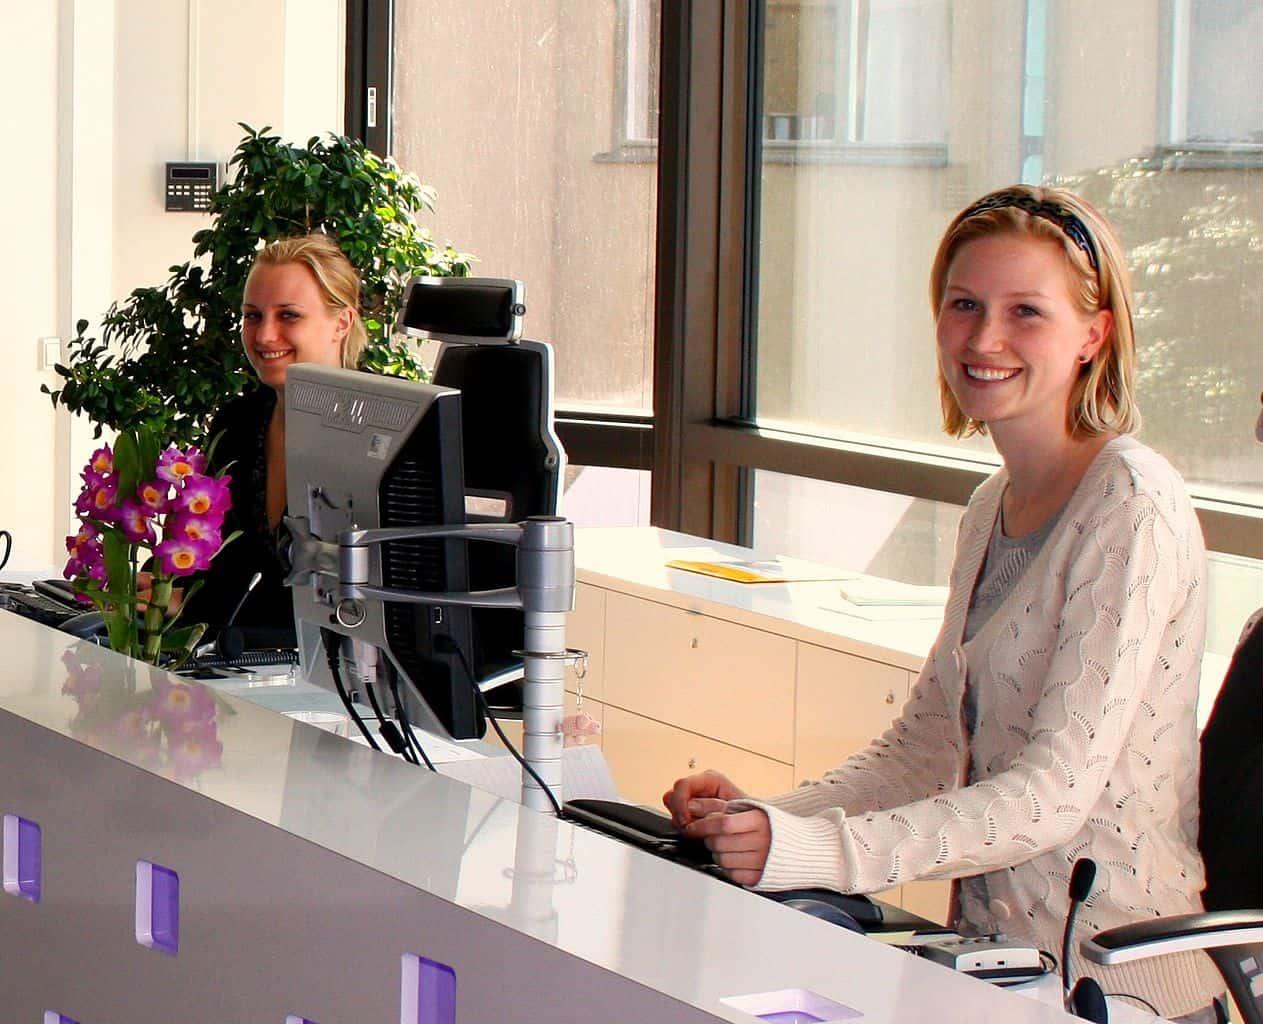 Beyond the reception desk